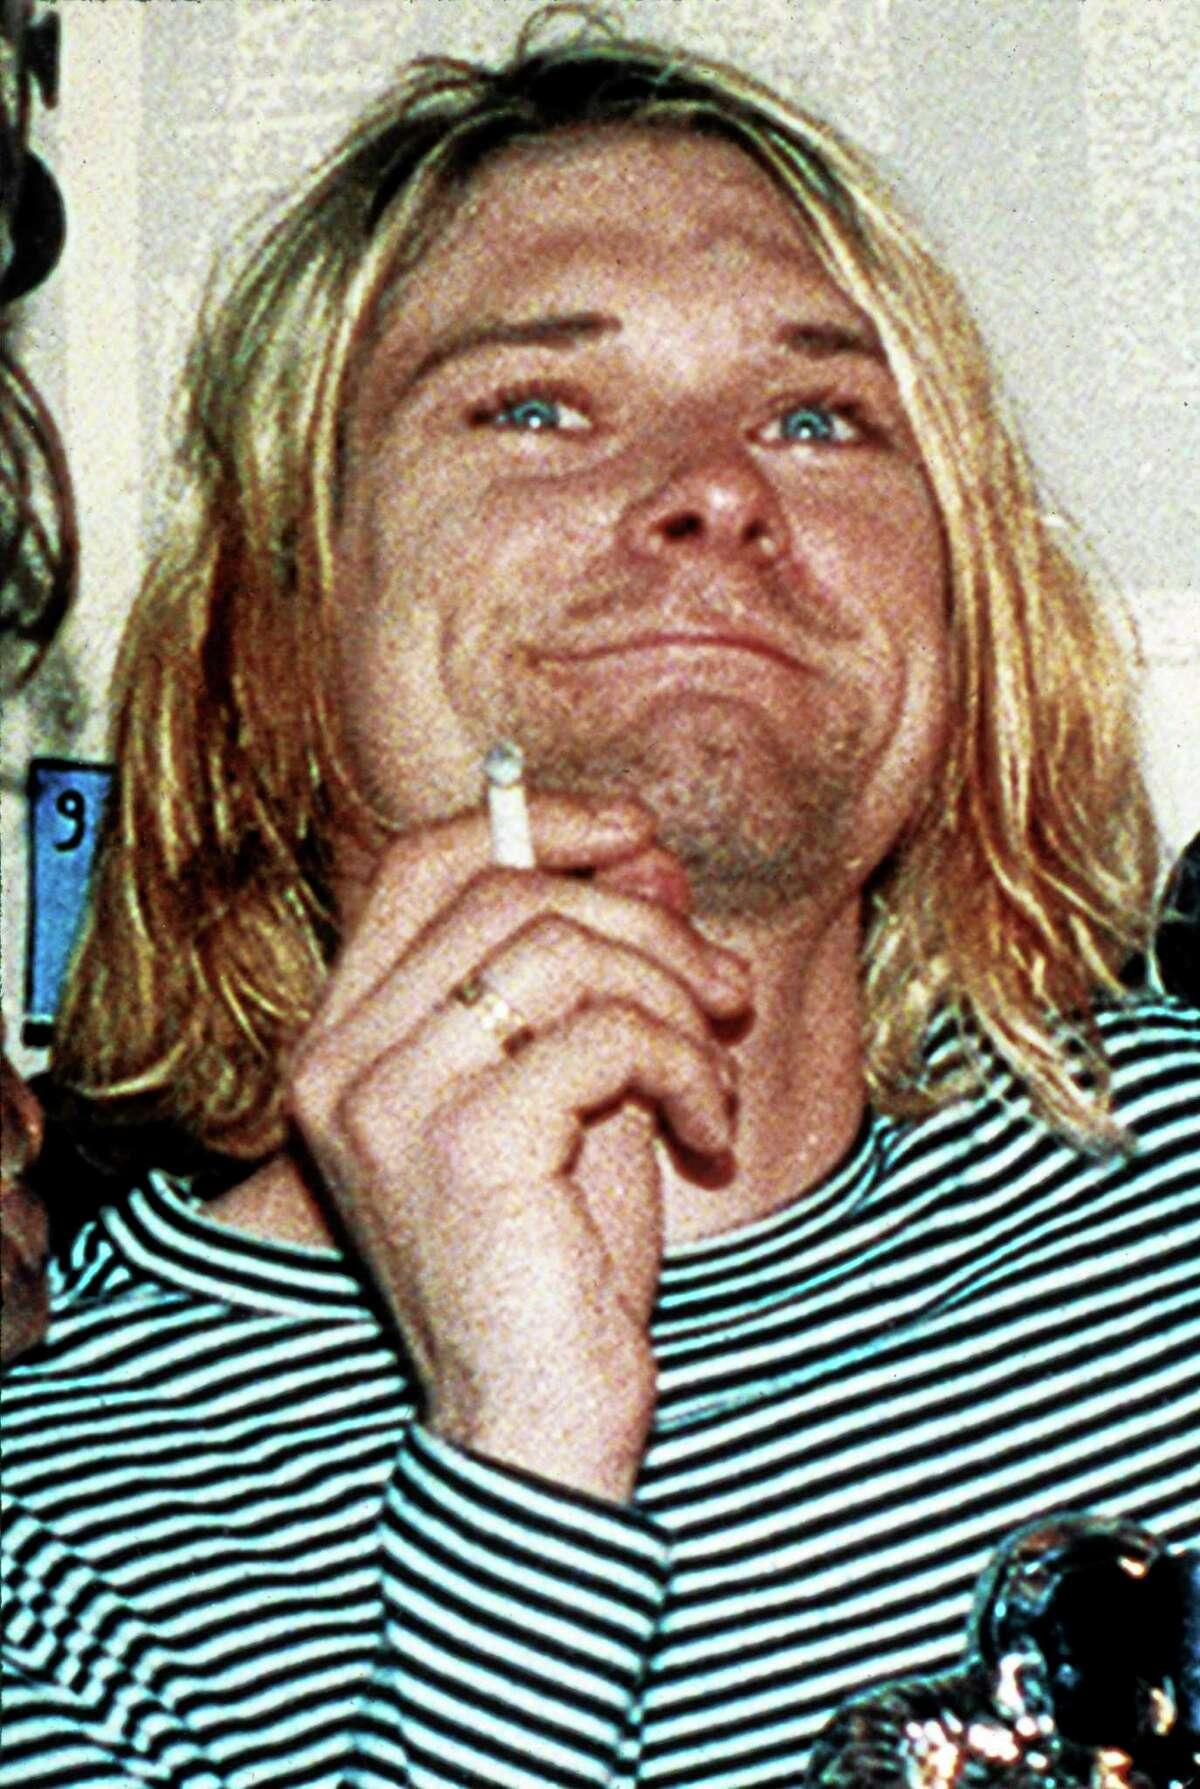 FILE - This 1993 file photo shows Kurt Cobain, lead singer of Nirvana.